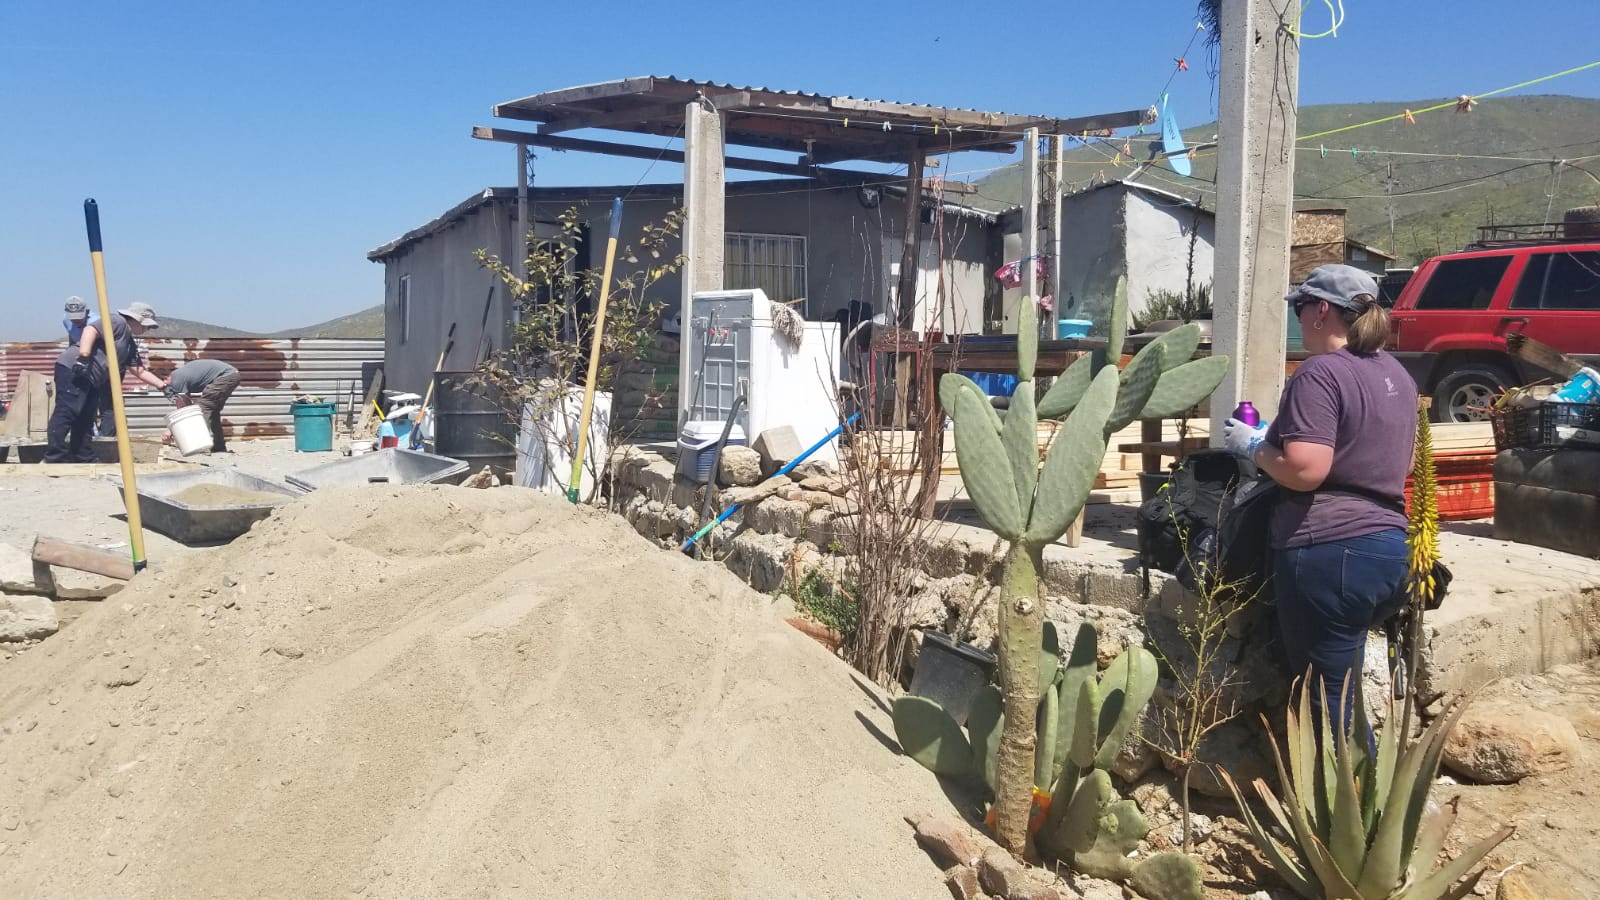 mexico2019 6.jpeg